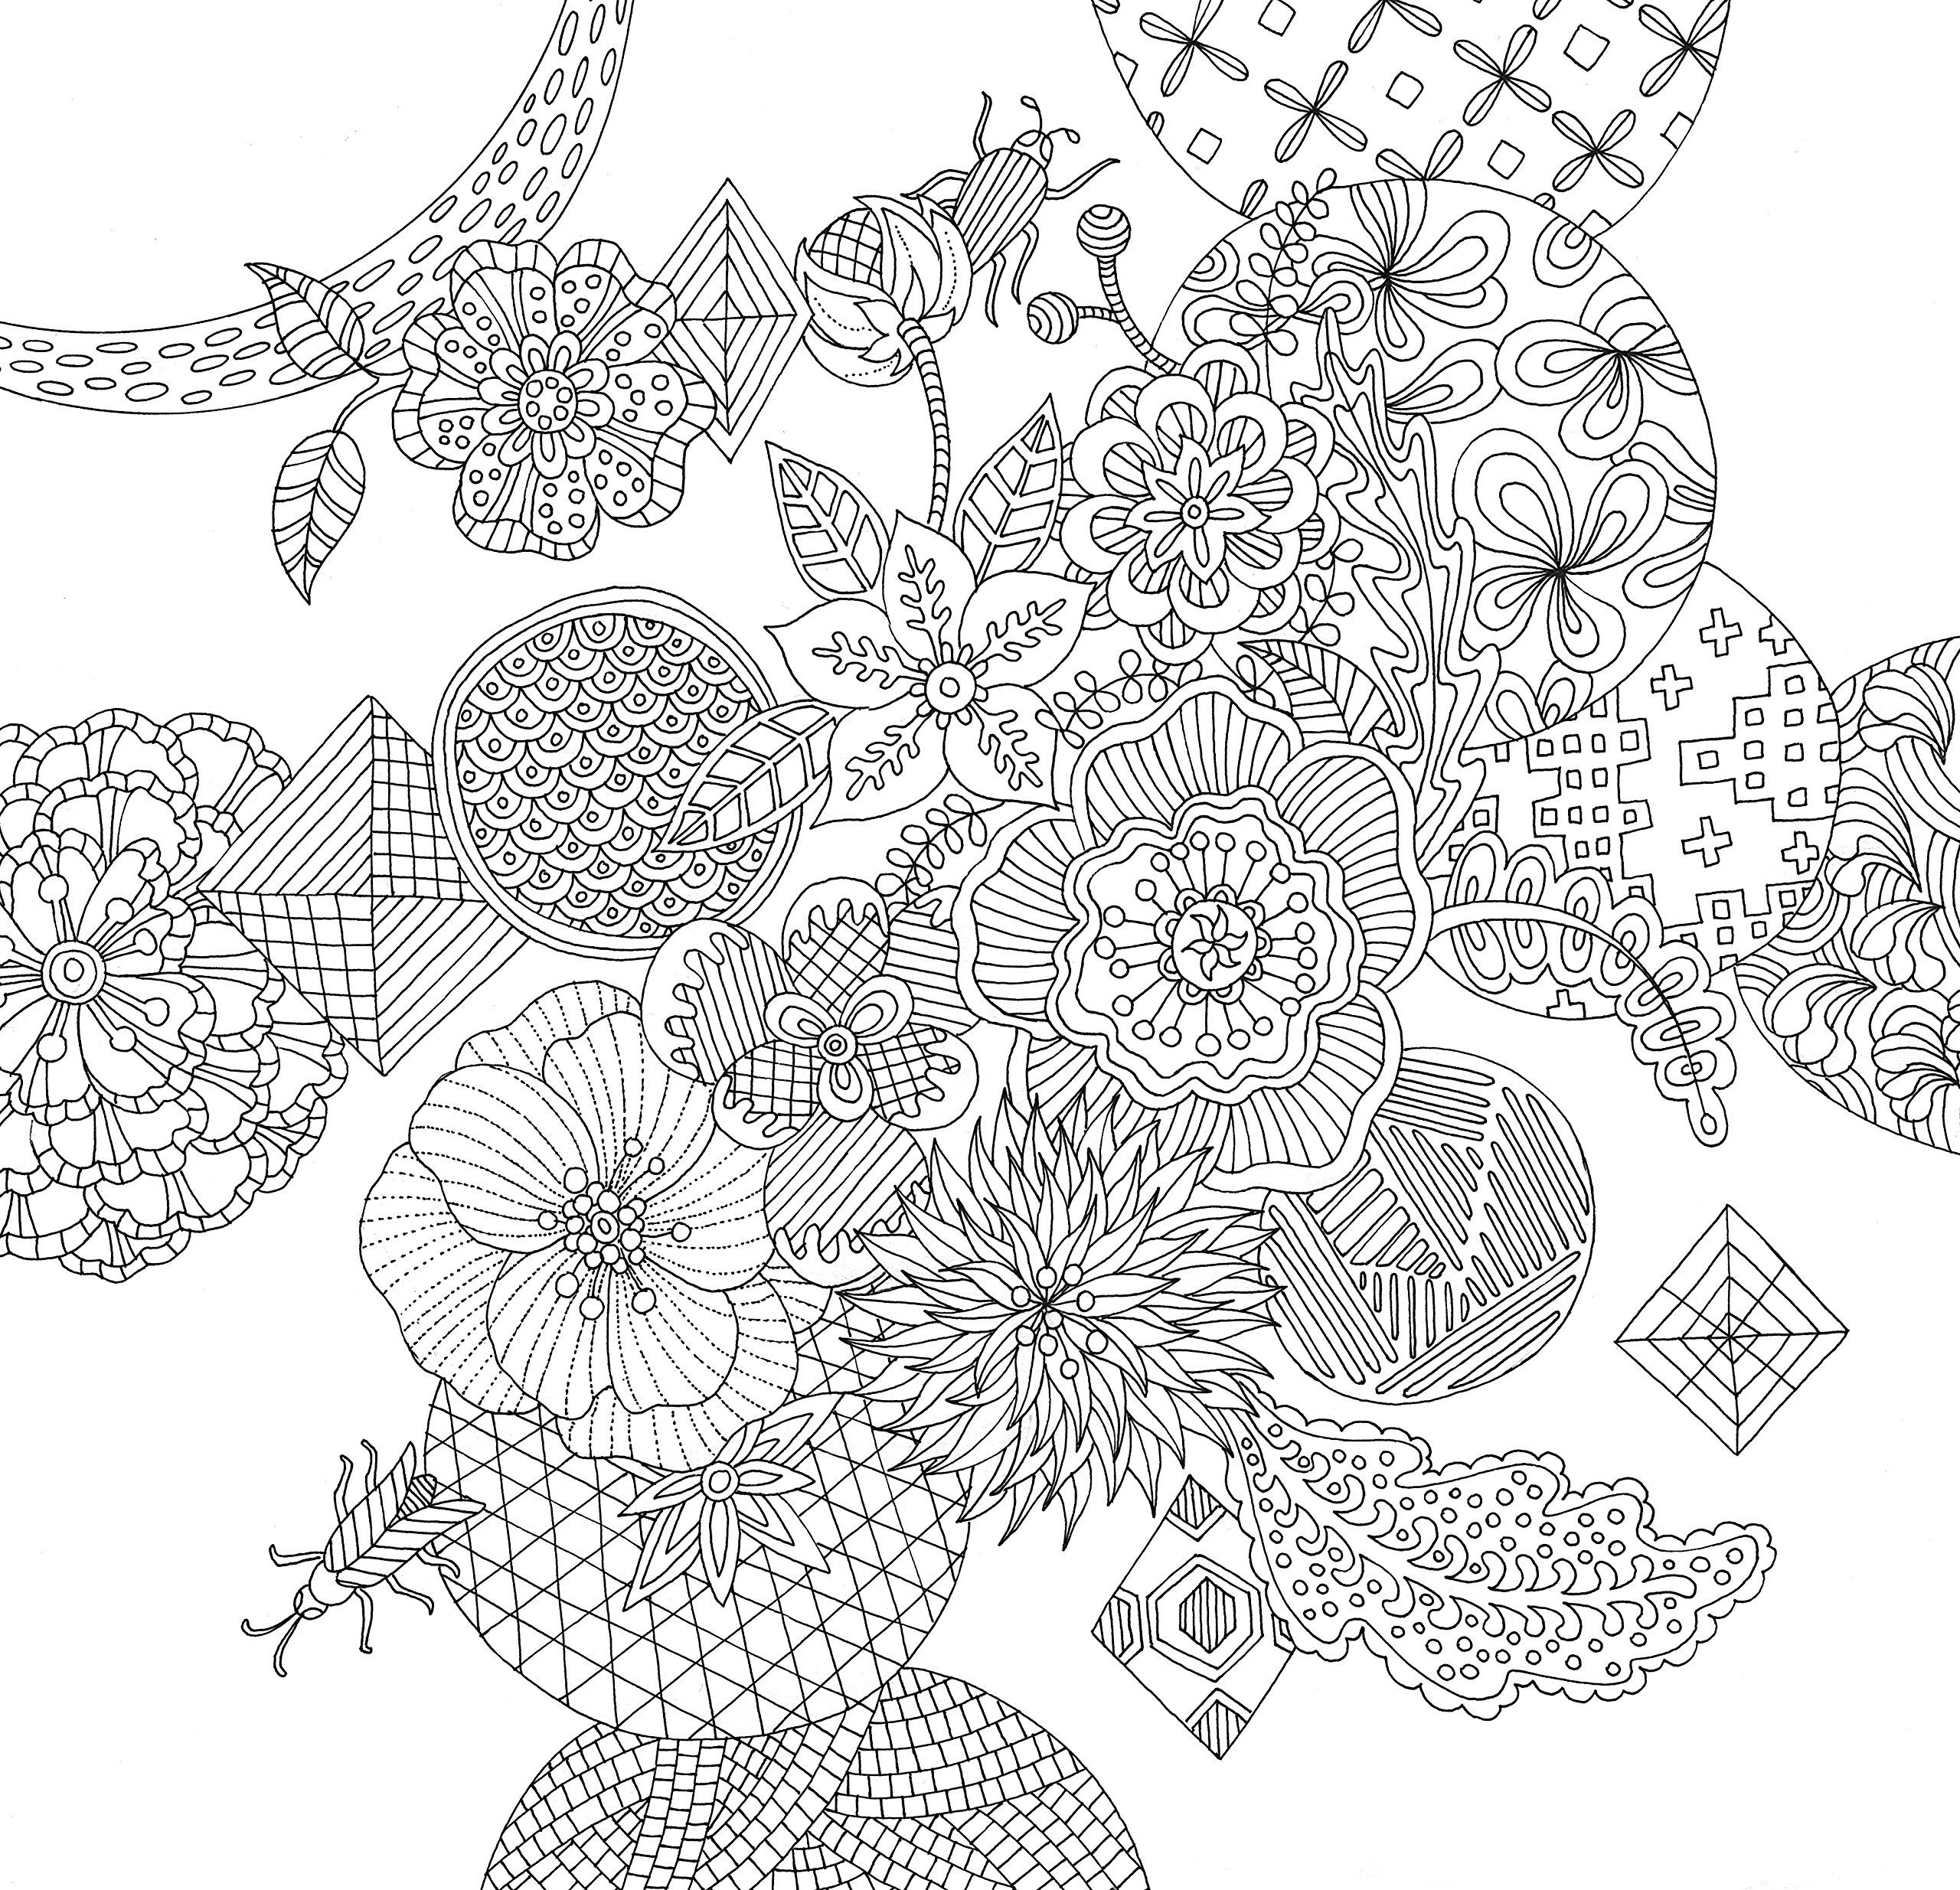 Zen Coloring Pages Pdf : Coloring pages adults zen free page